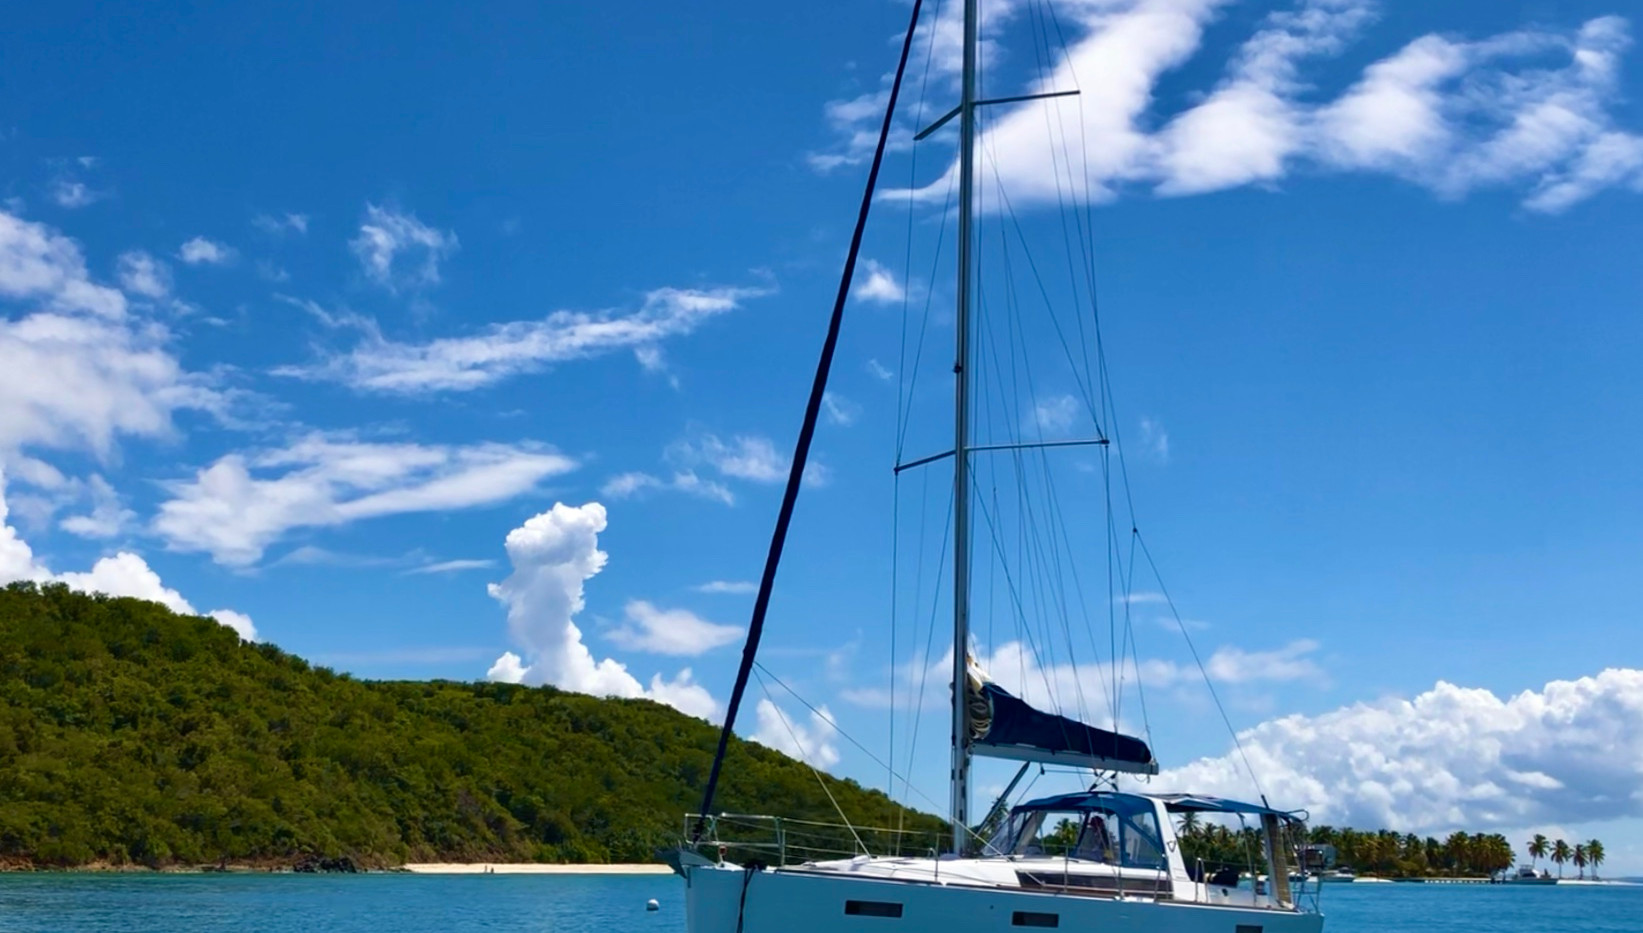 Puerto Rico Sailing Adventure Charter